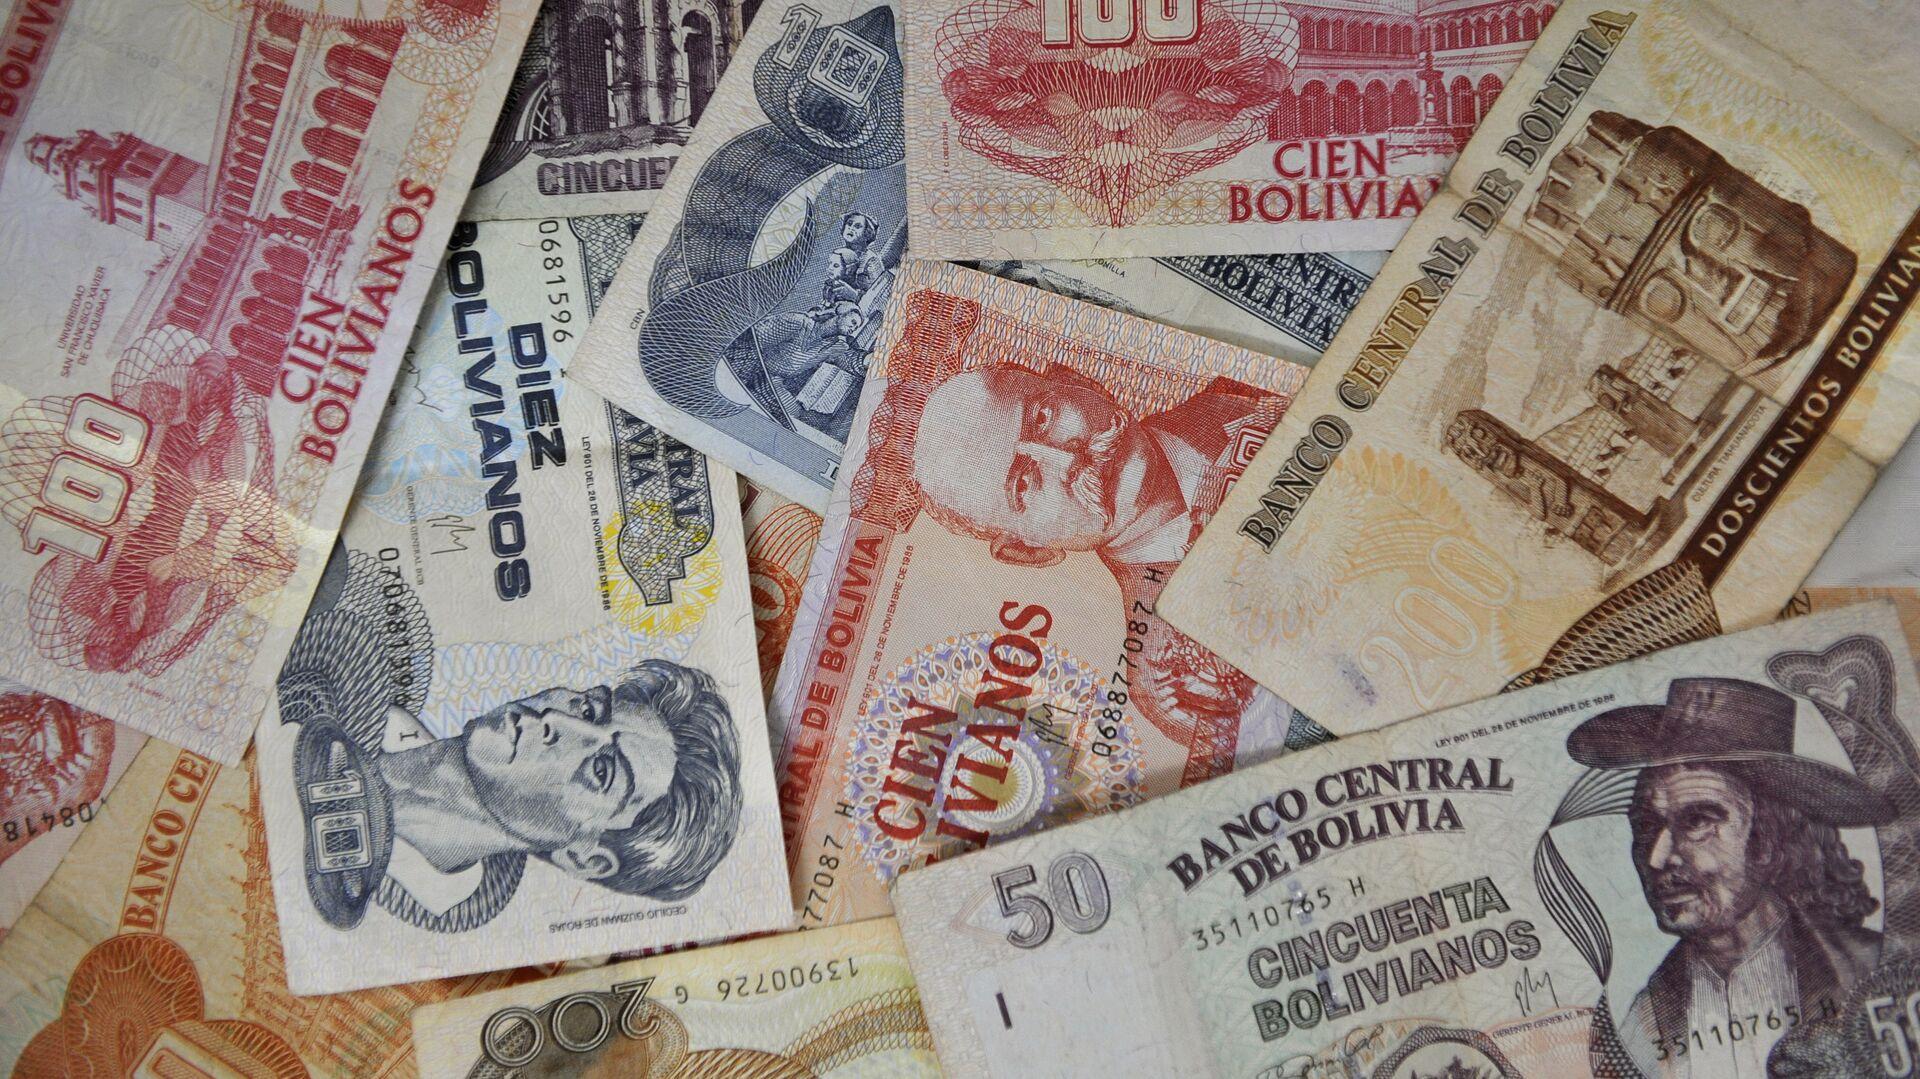 Bolivianos (billetes) - Sputnik Mundo, 1920, 17.09.2021